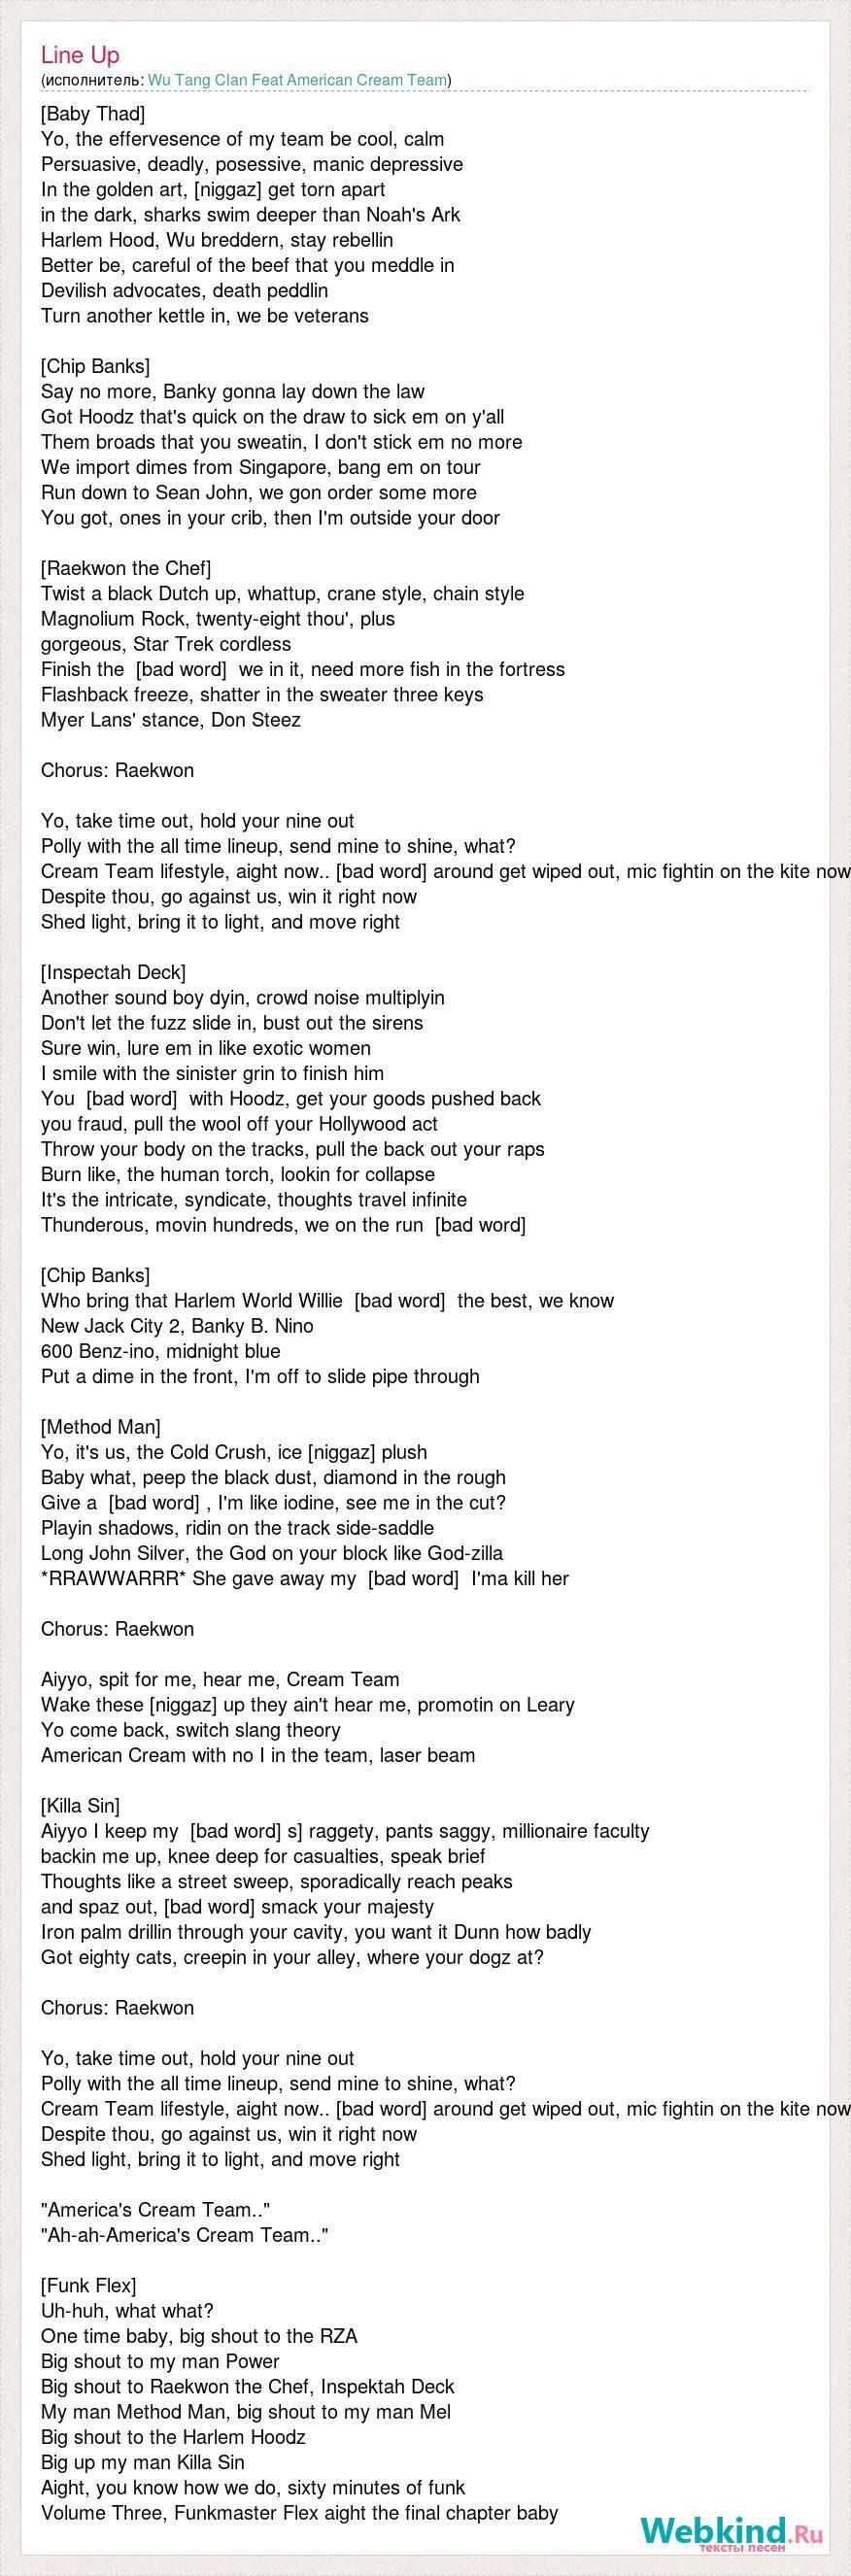 Wu Tang Clan Feat American Cream Team: Line Up слова песни